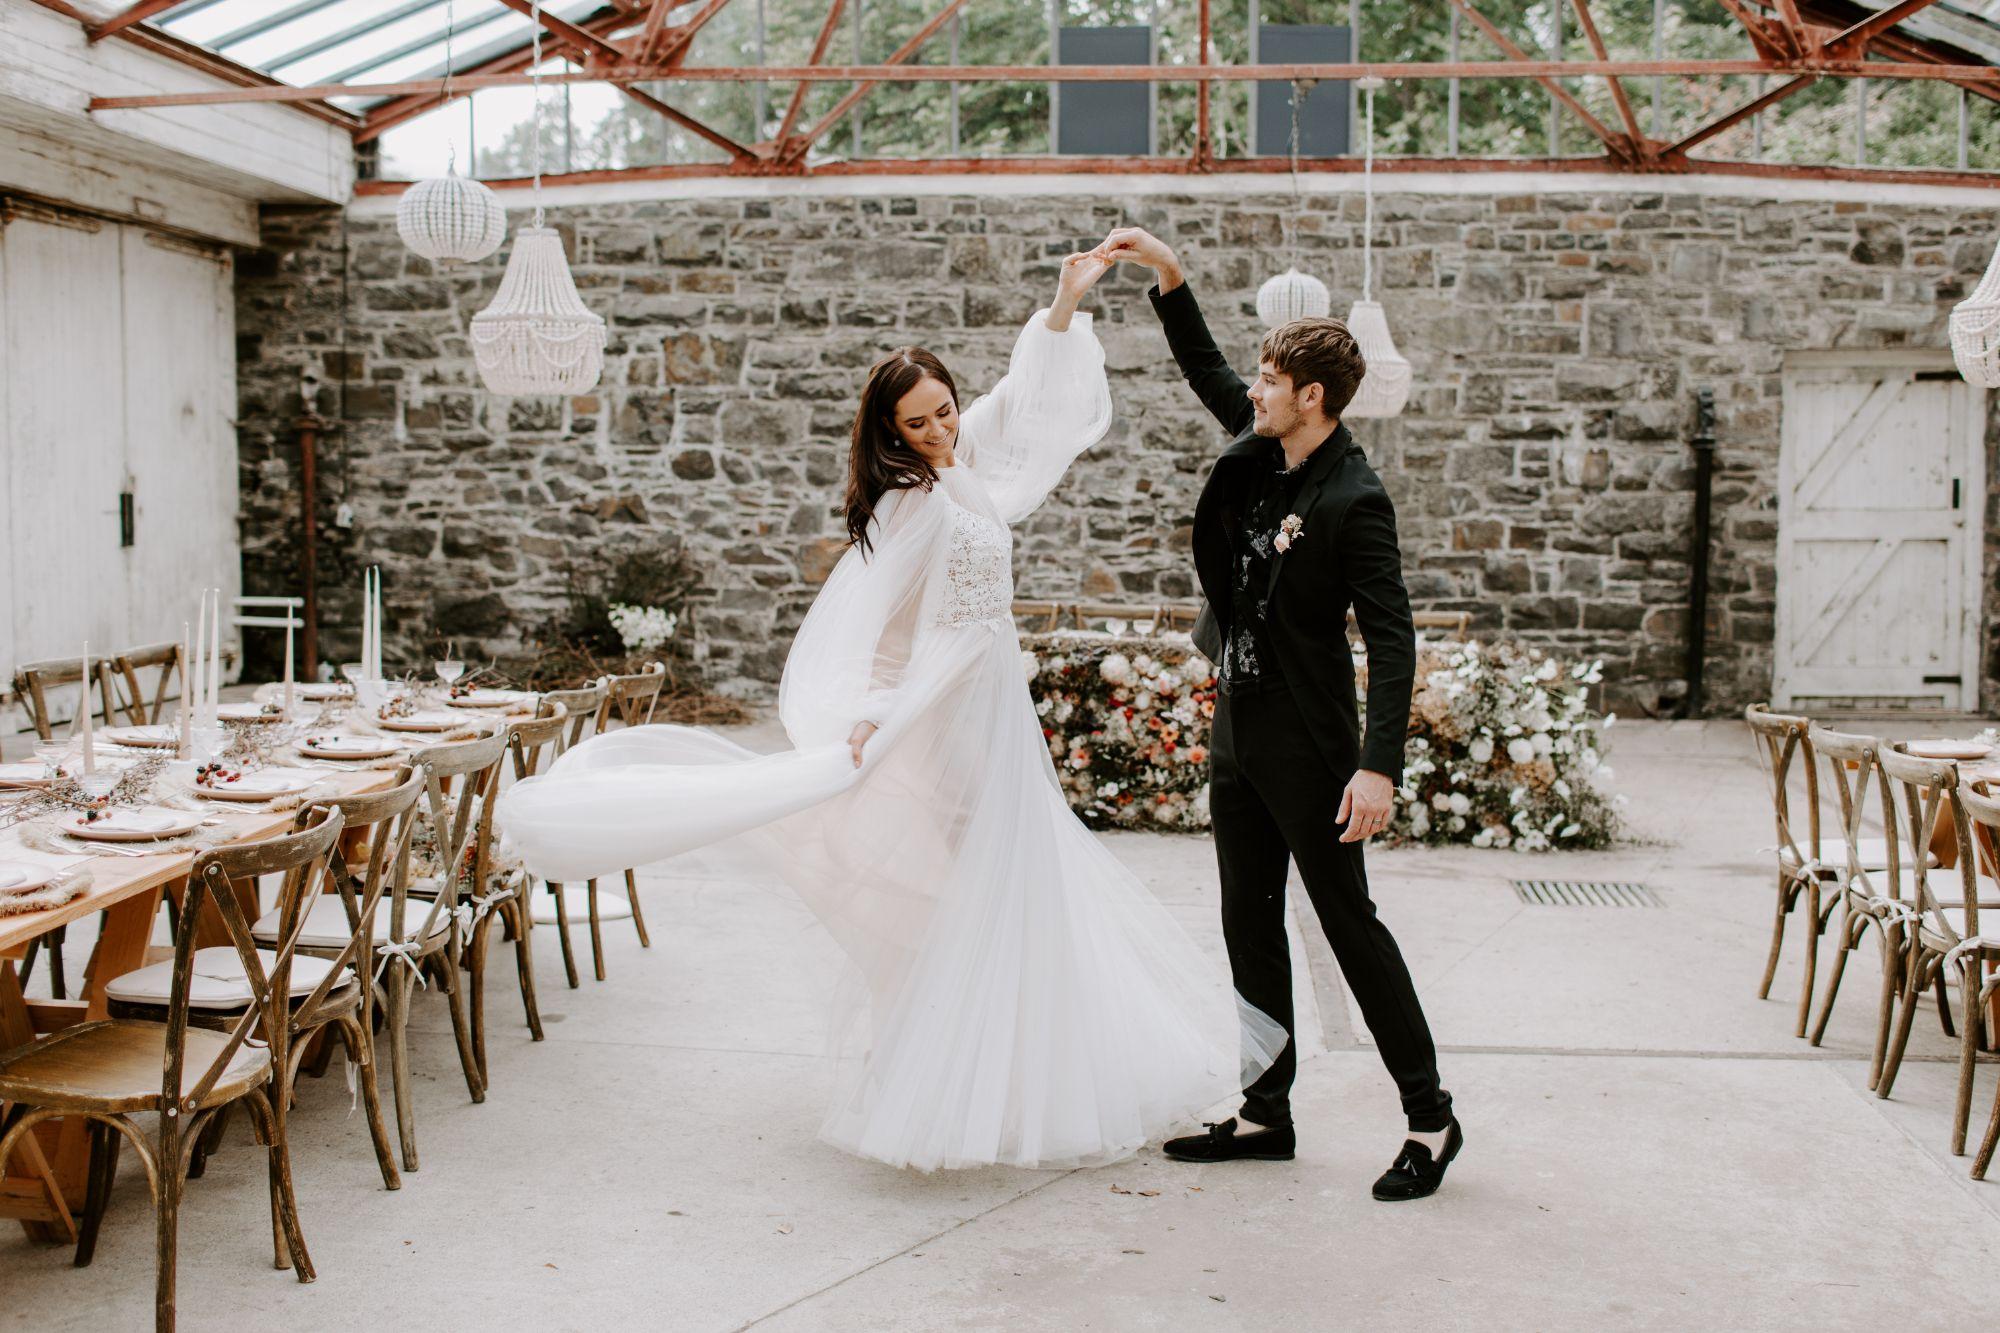 Wedding_Photography_Becky_Tranter-97.jpg